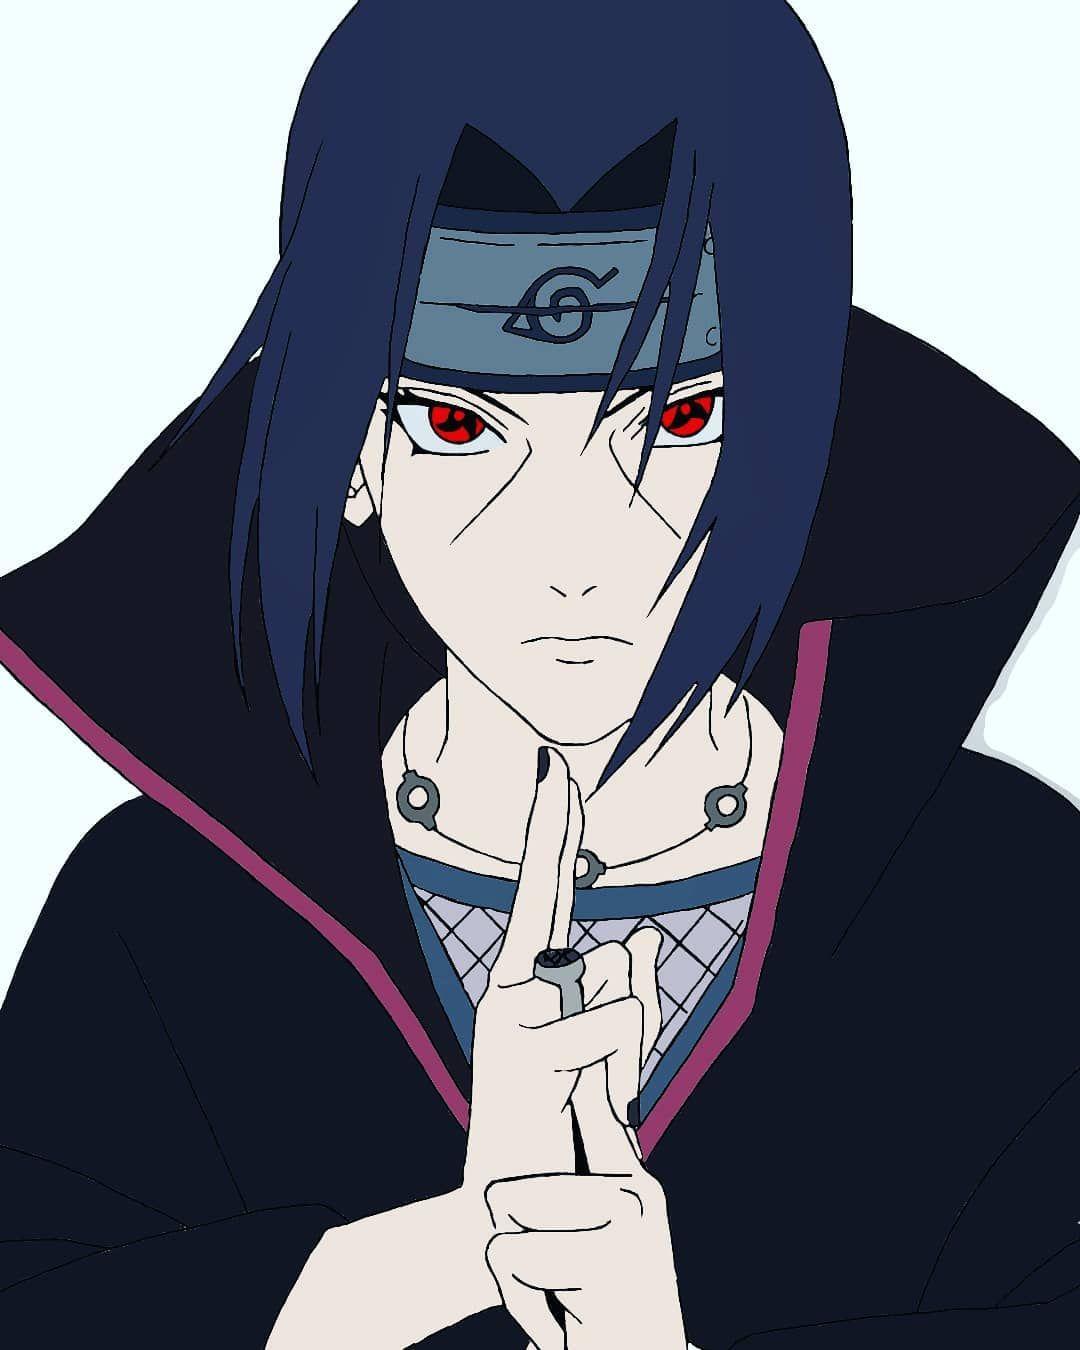 Character Name Itachi Uchiha Name Of The Anime Naruto Google Images Pt 2 Art Artist Artistsonin In 2020 Wie Zeichnet Man Manga Anime